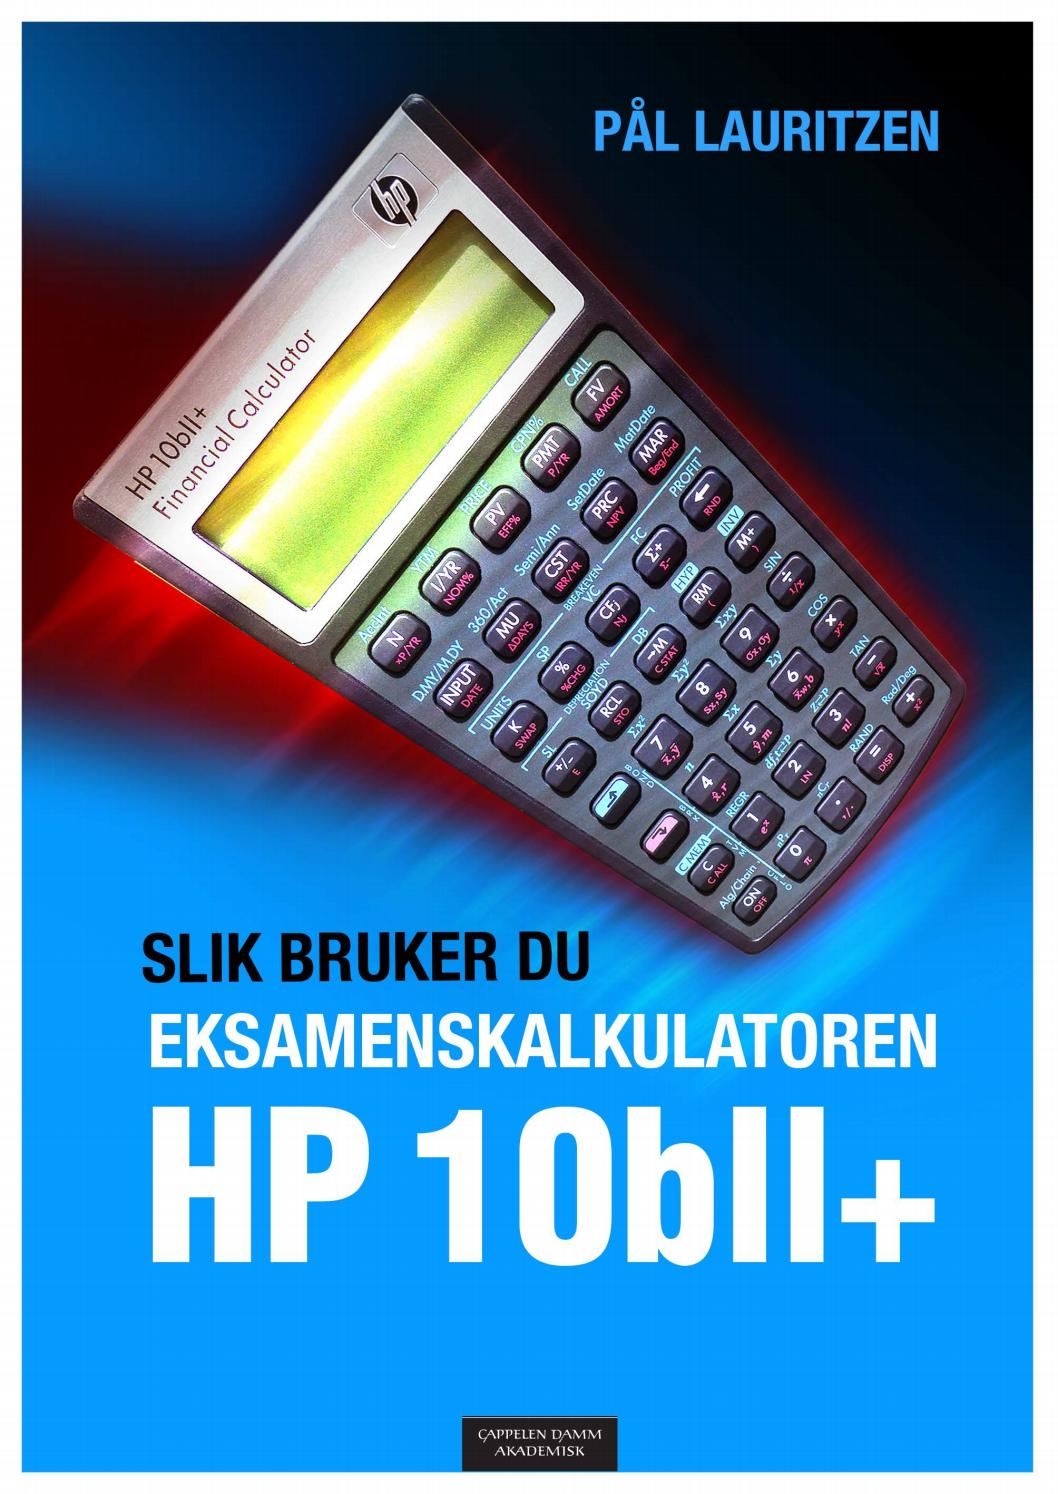 Potens kalkulator